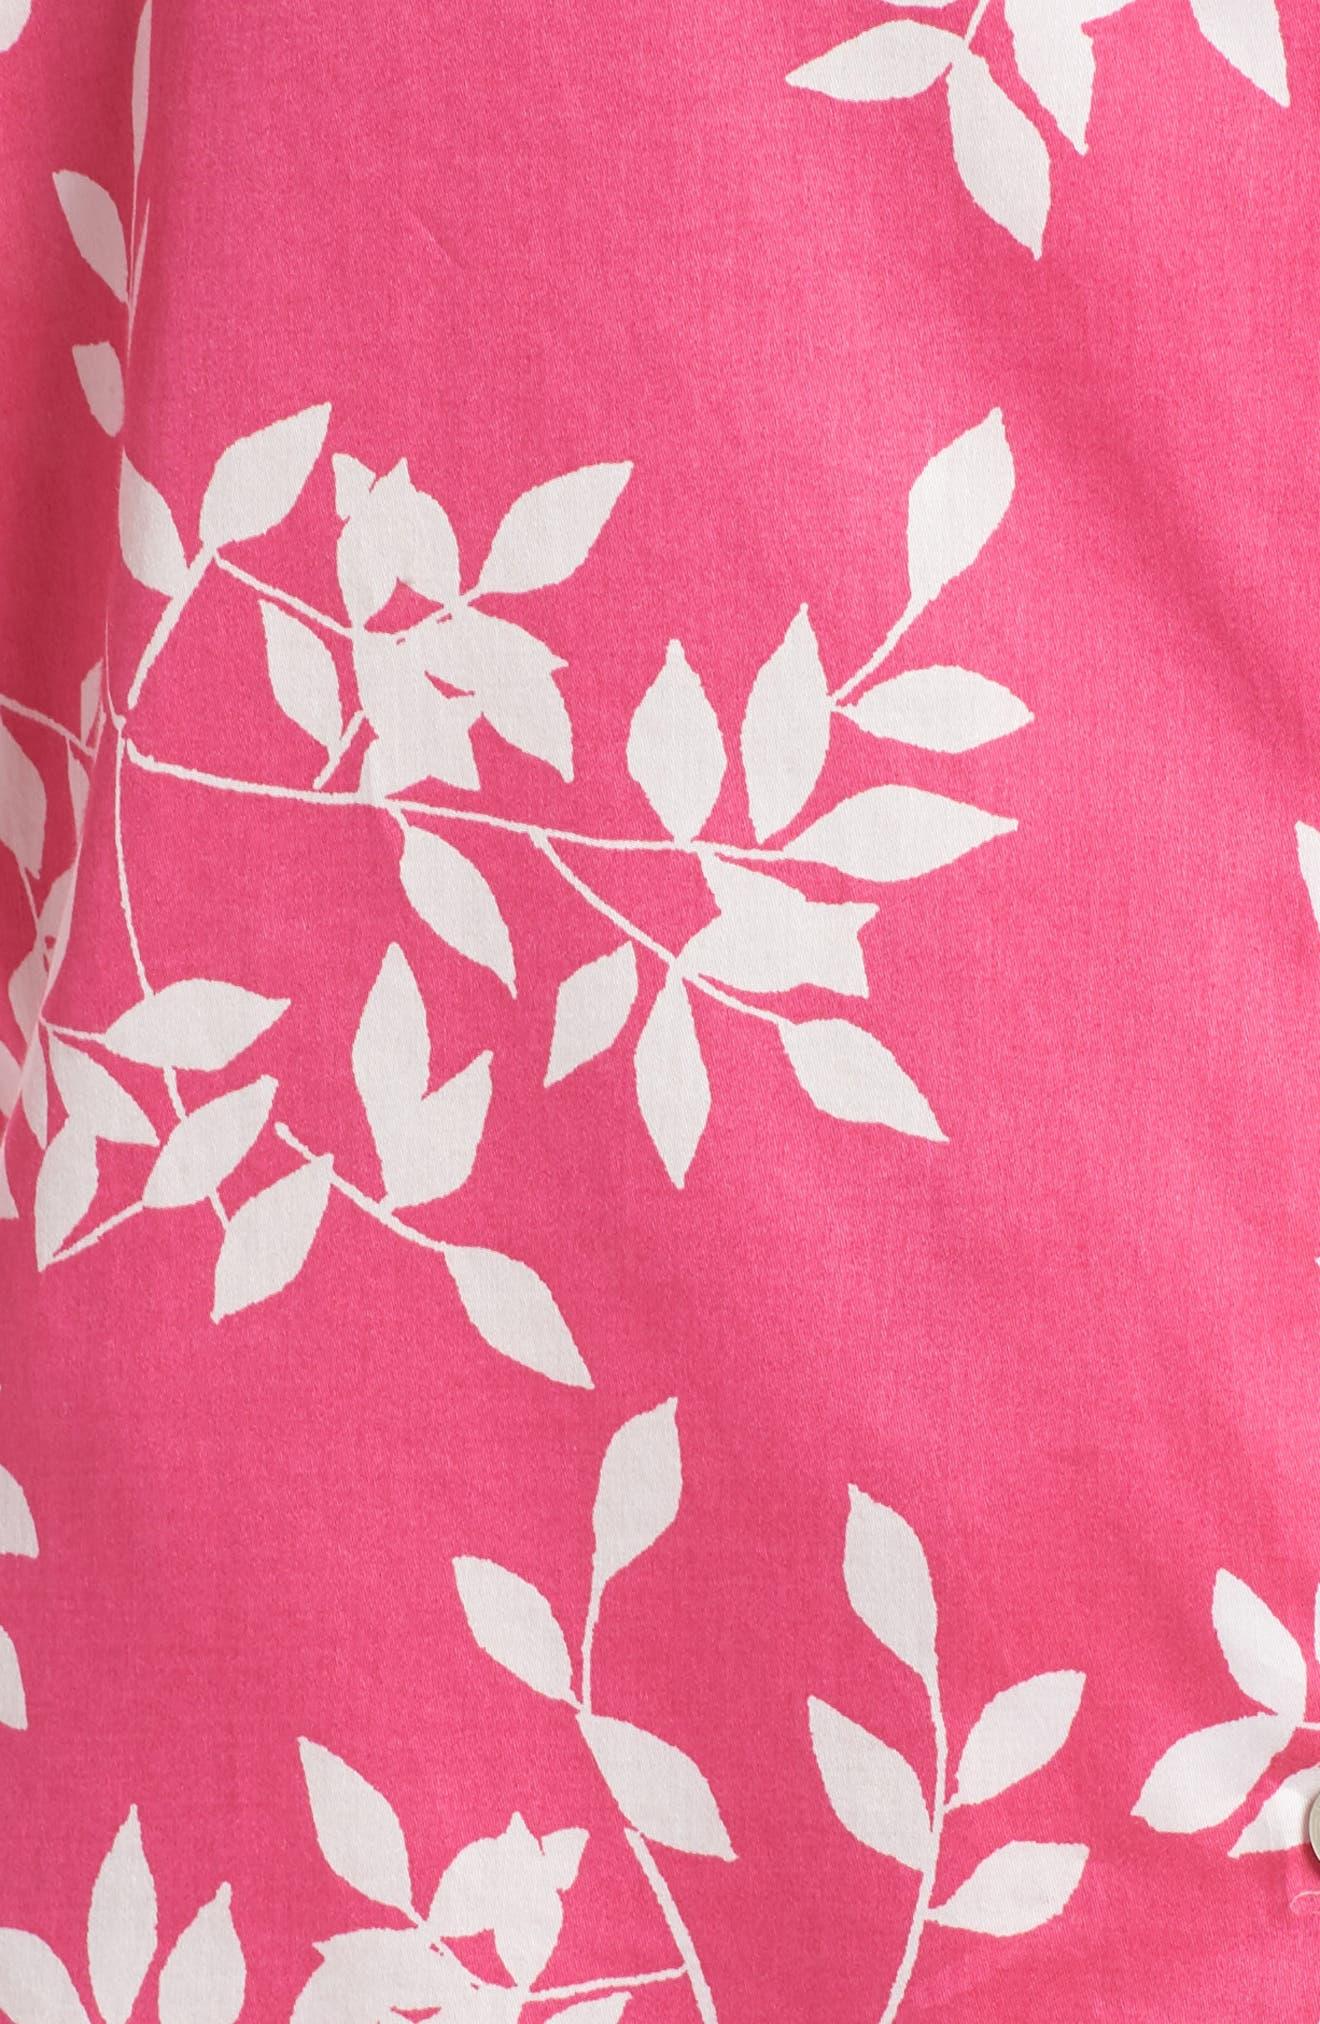 Branch Print Cotton Sateen Short Pajamas,                             Alternate thumbnail 6, color,                             Hibiscus Pink